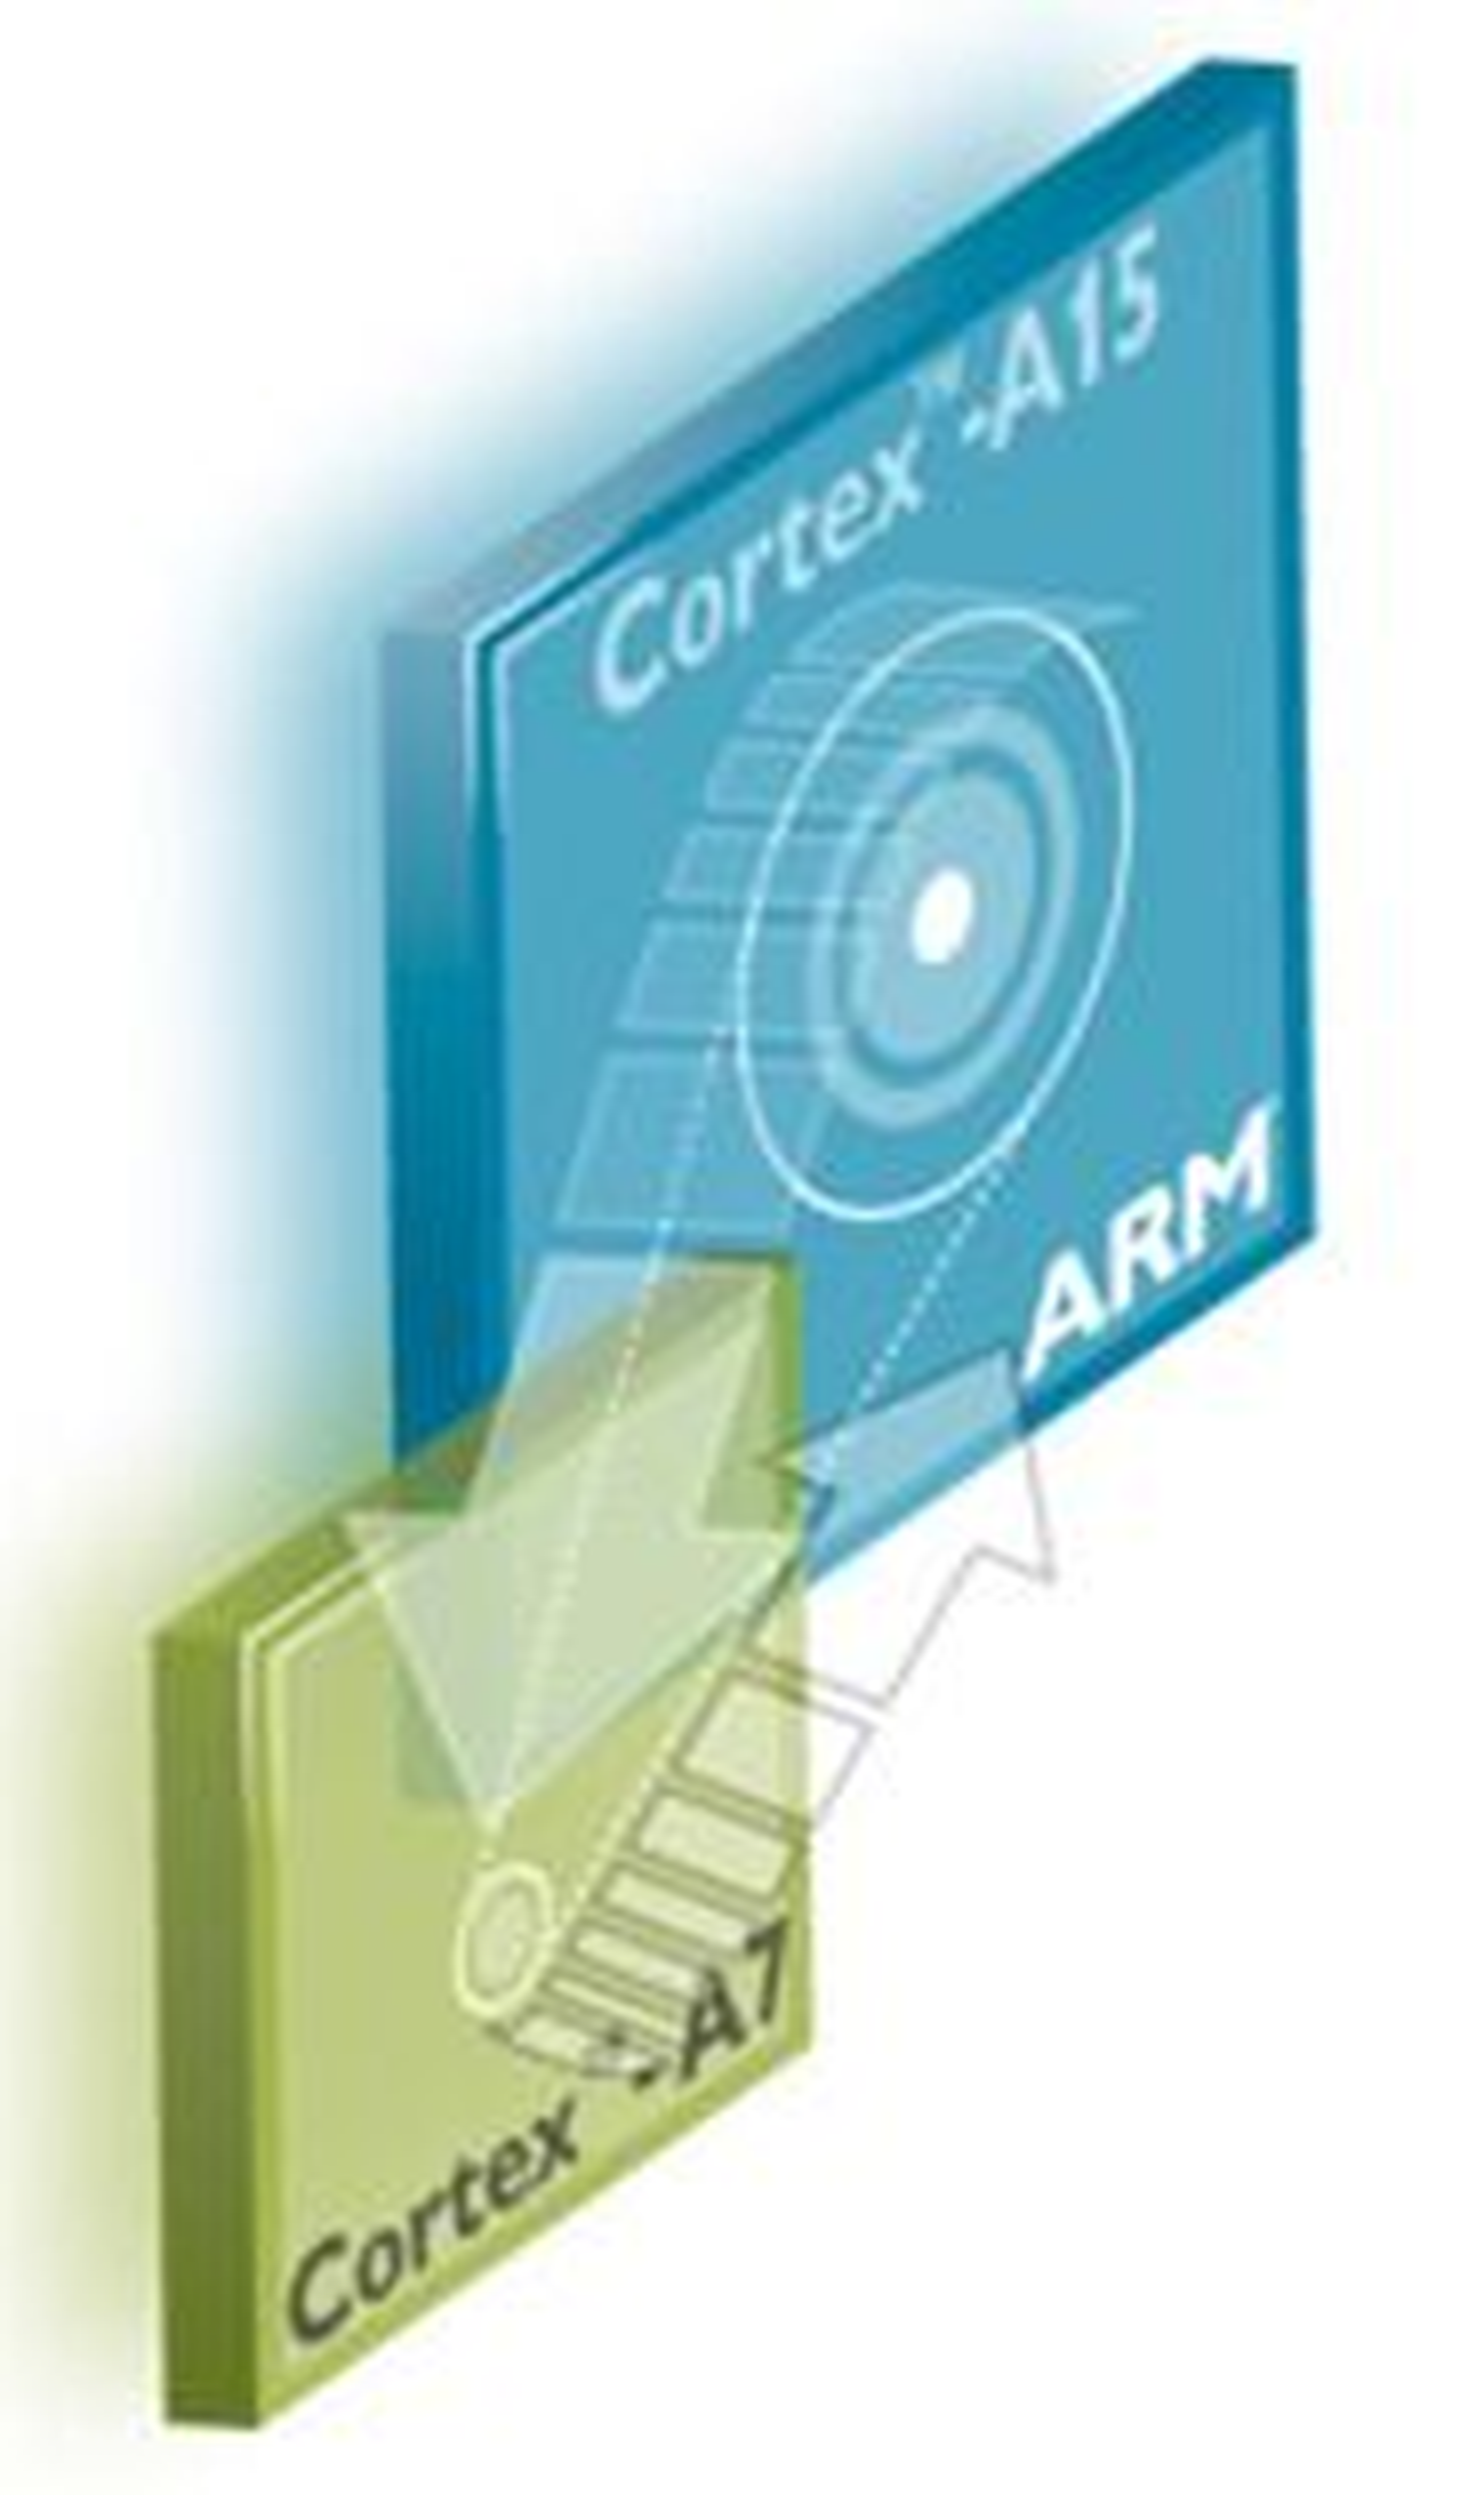 Med ARMs Big.Little Processing flyttes programvaren mellom energieffektive Cortex-A7 og den kraftige Cortex-A15 etter behov.